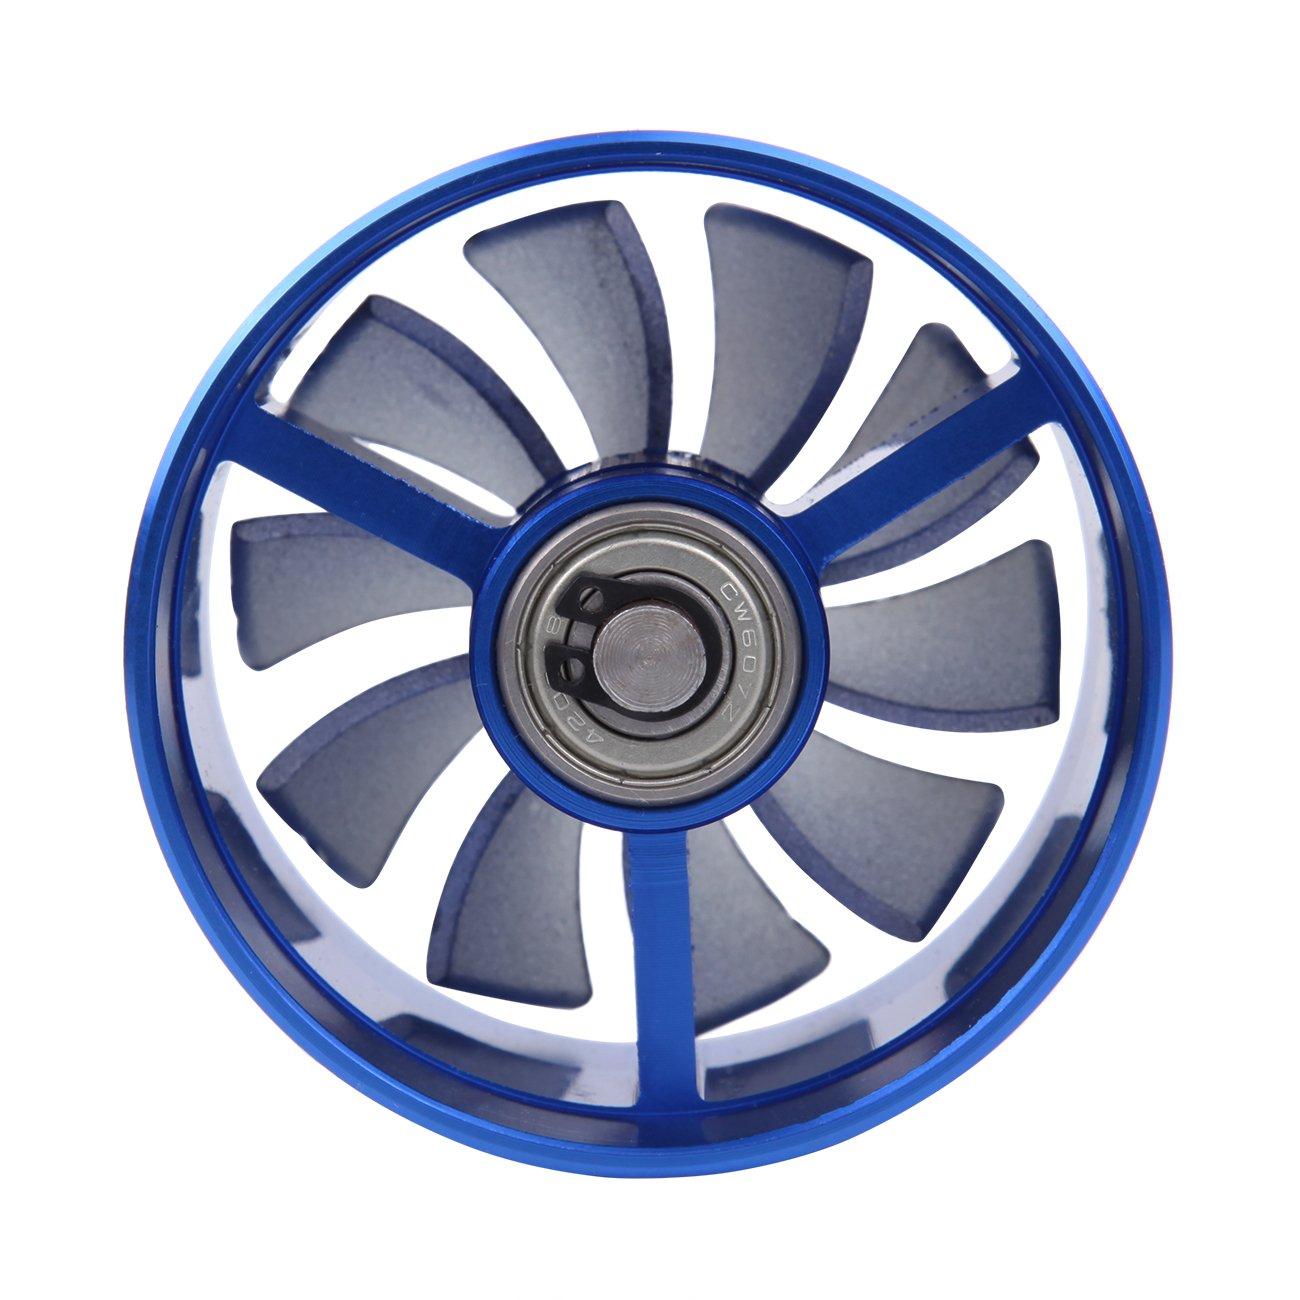 Ambienceo 2.5-2.9 Universal Car Gas Fuel Turbo Saver Fan Supercharger Air Intake Turbonator